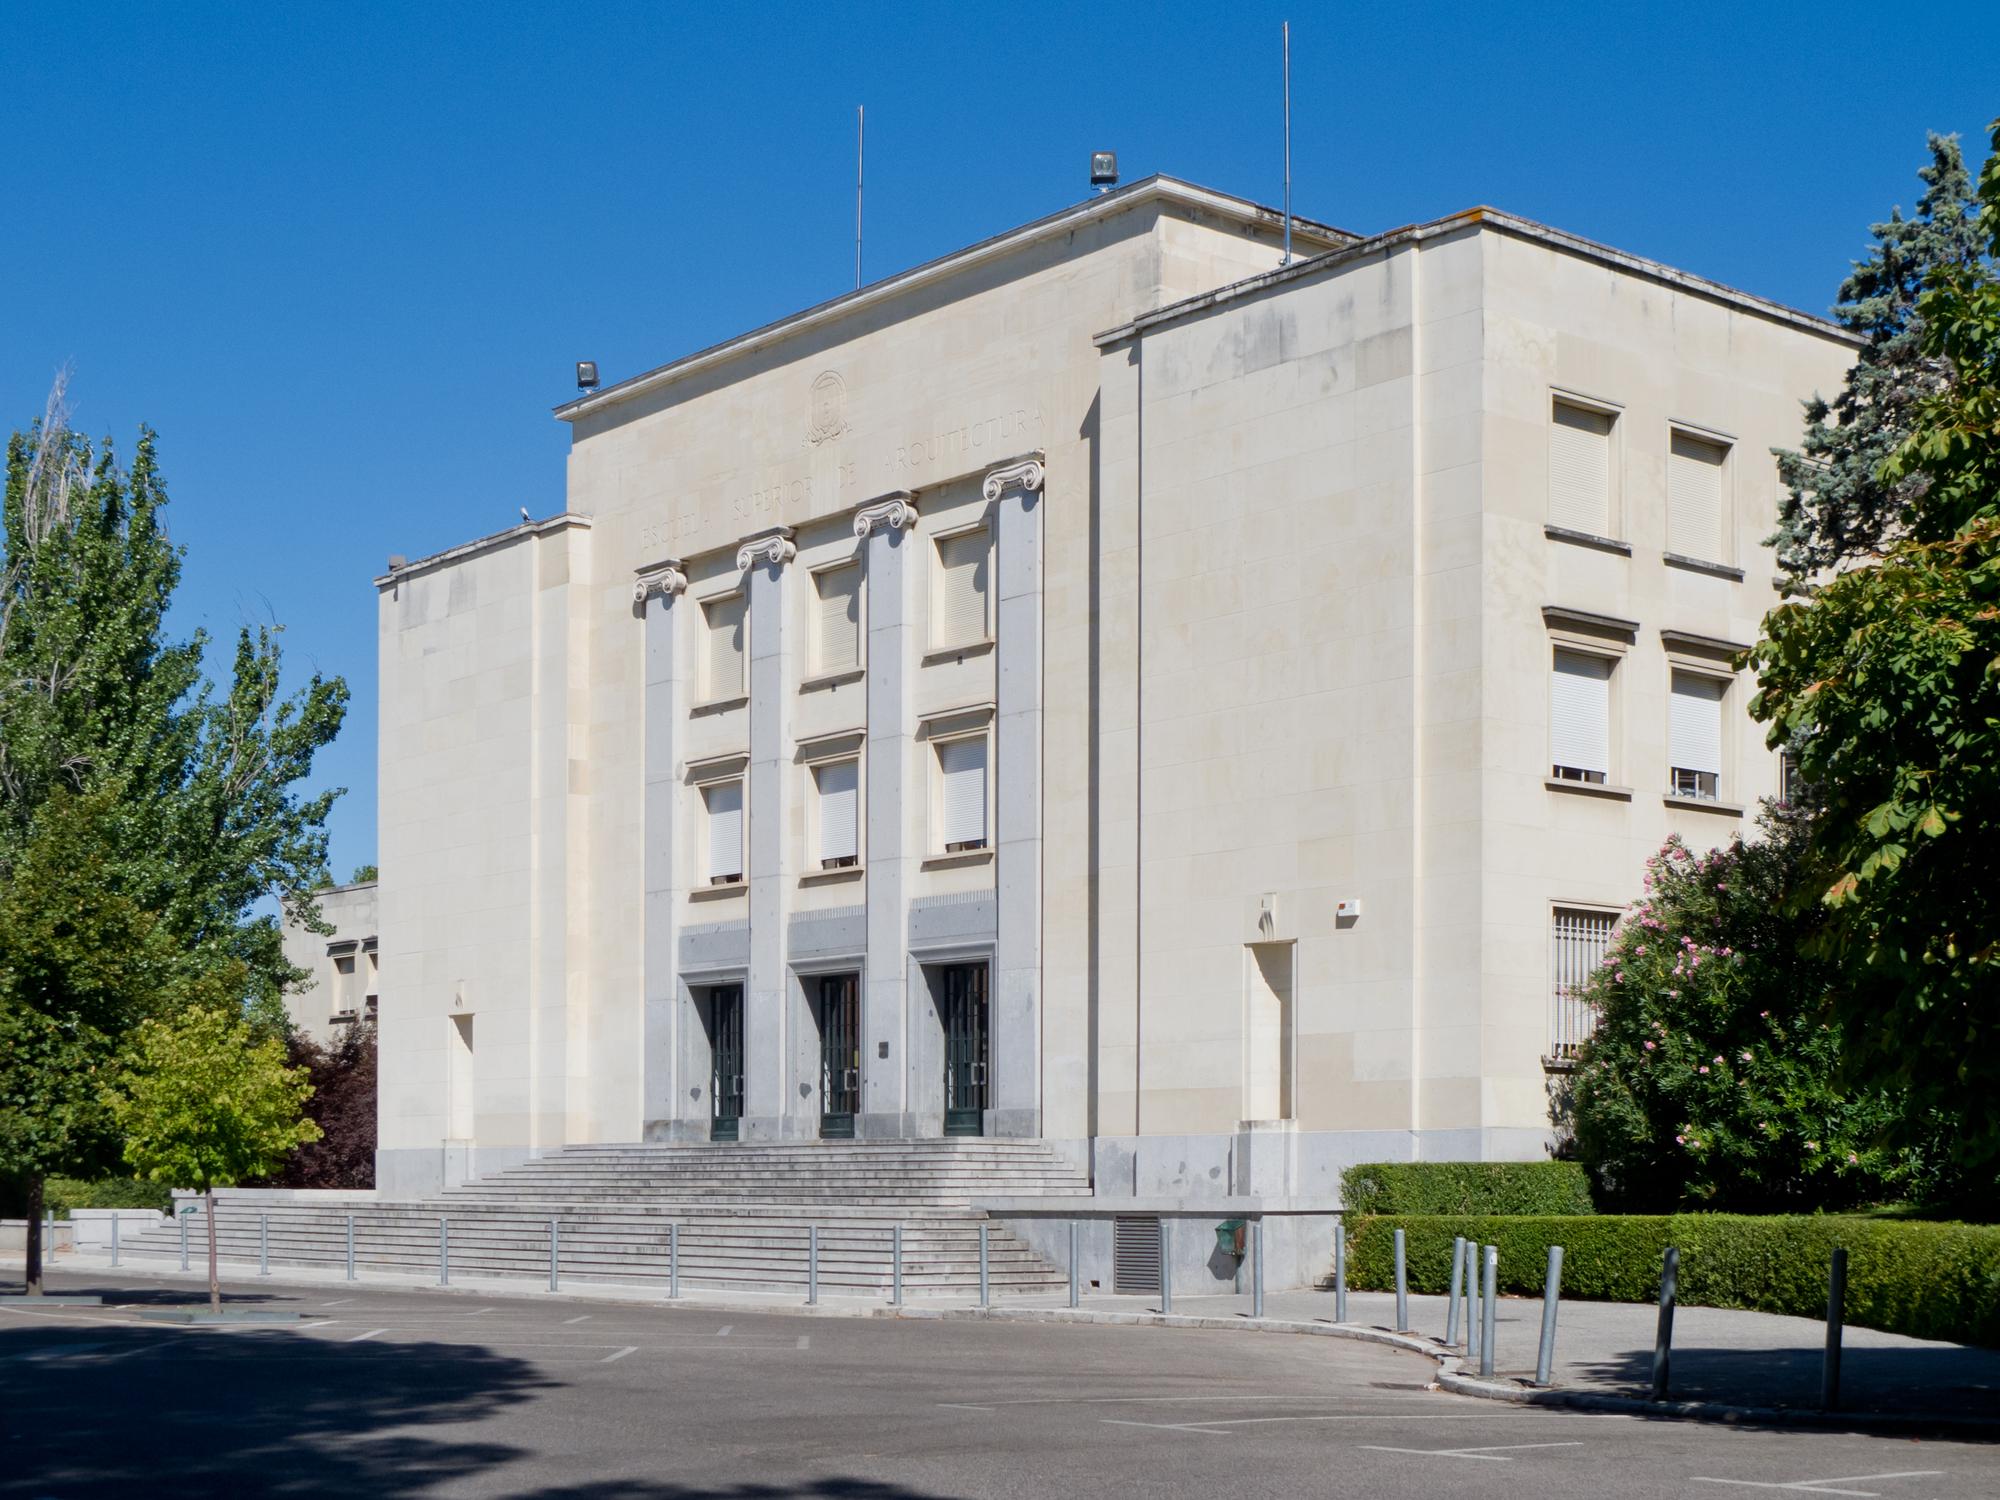 Escuela_t%c3%a9cnica_superior_de_arquitectura_de_madrid_-_01